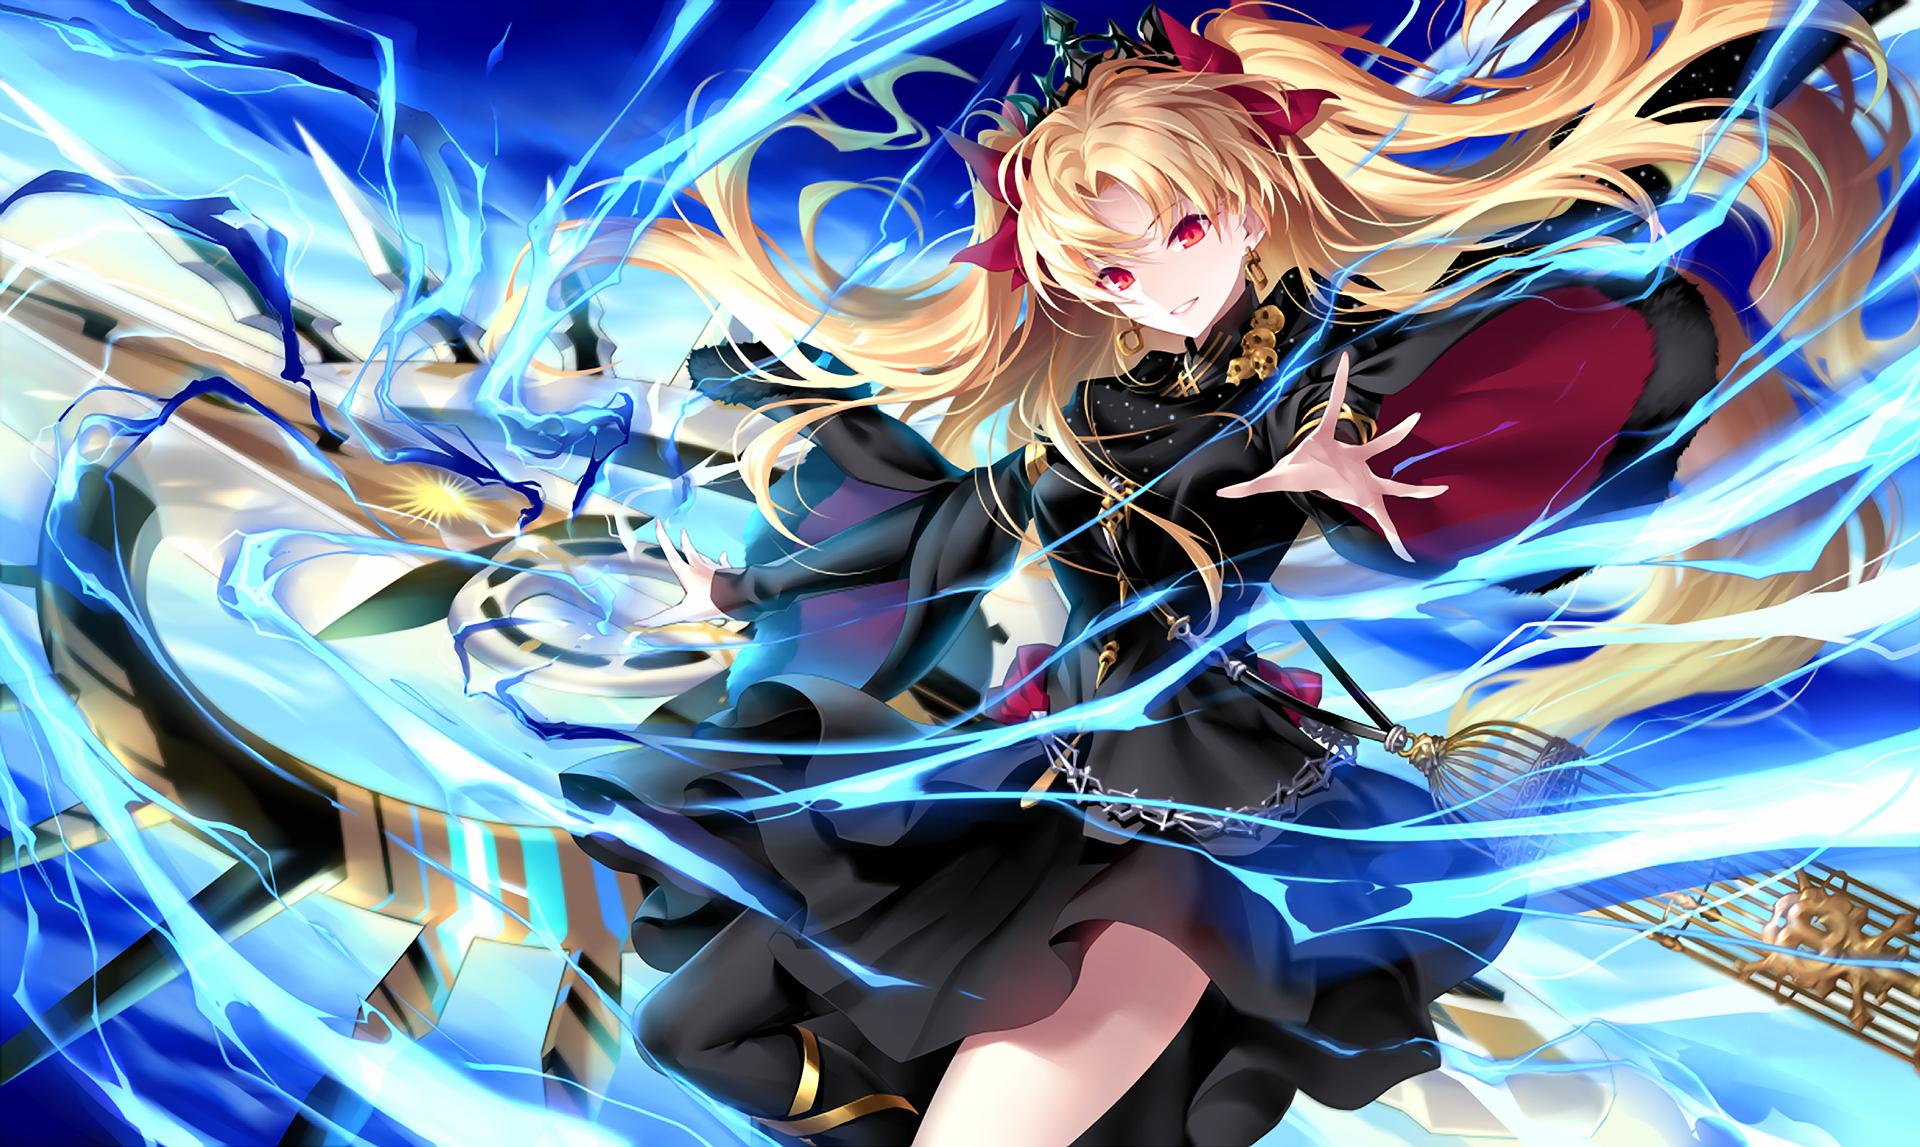 Anime Fate Grand Order Ereshkigal Fate Grand Order Wallpaper